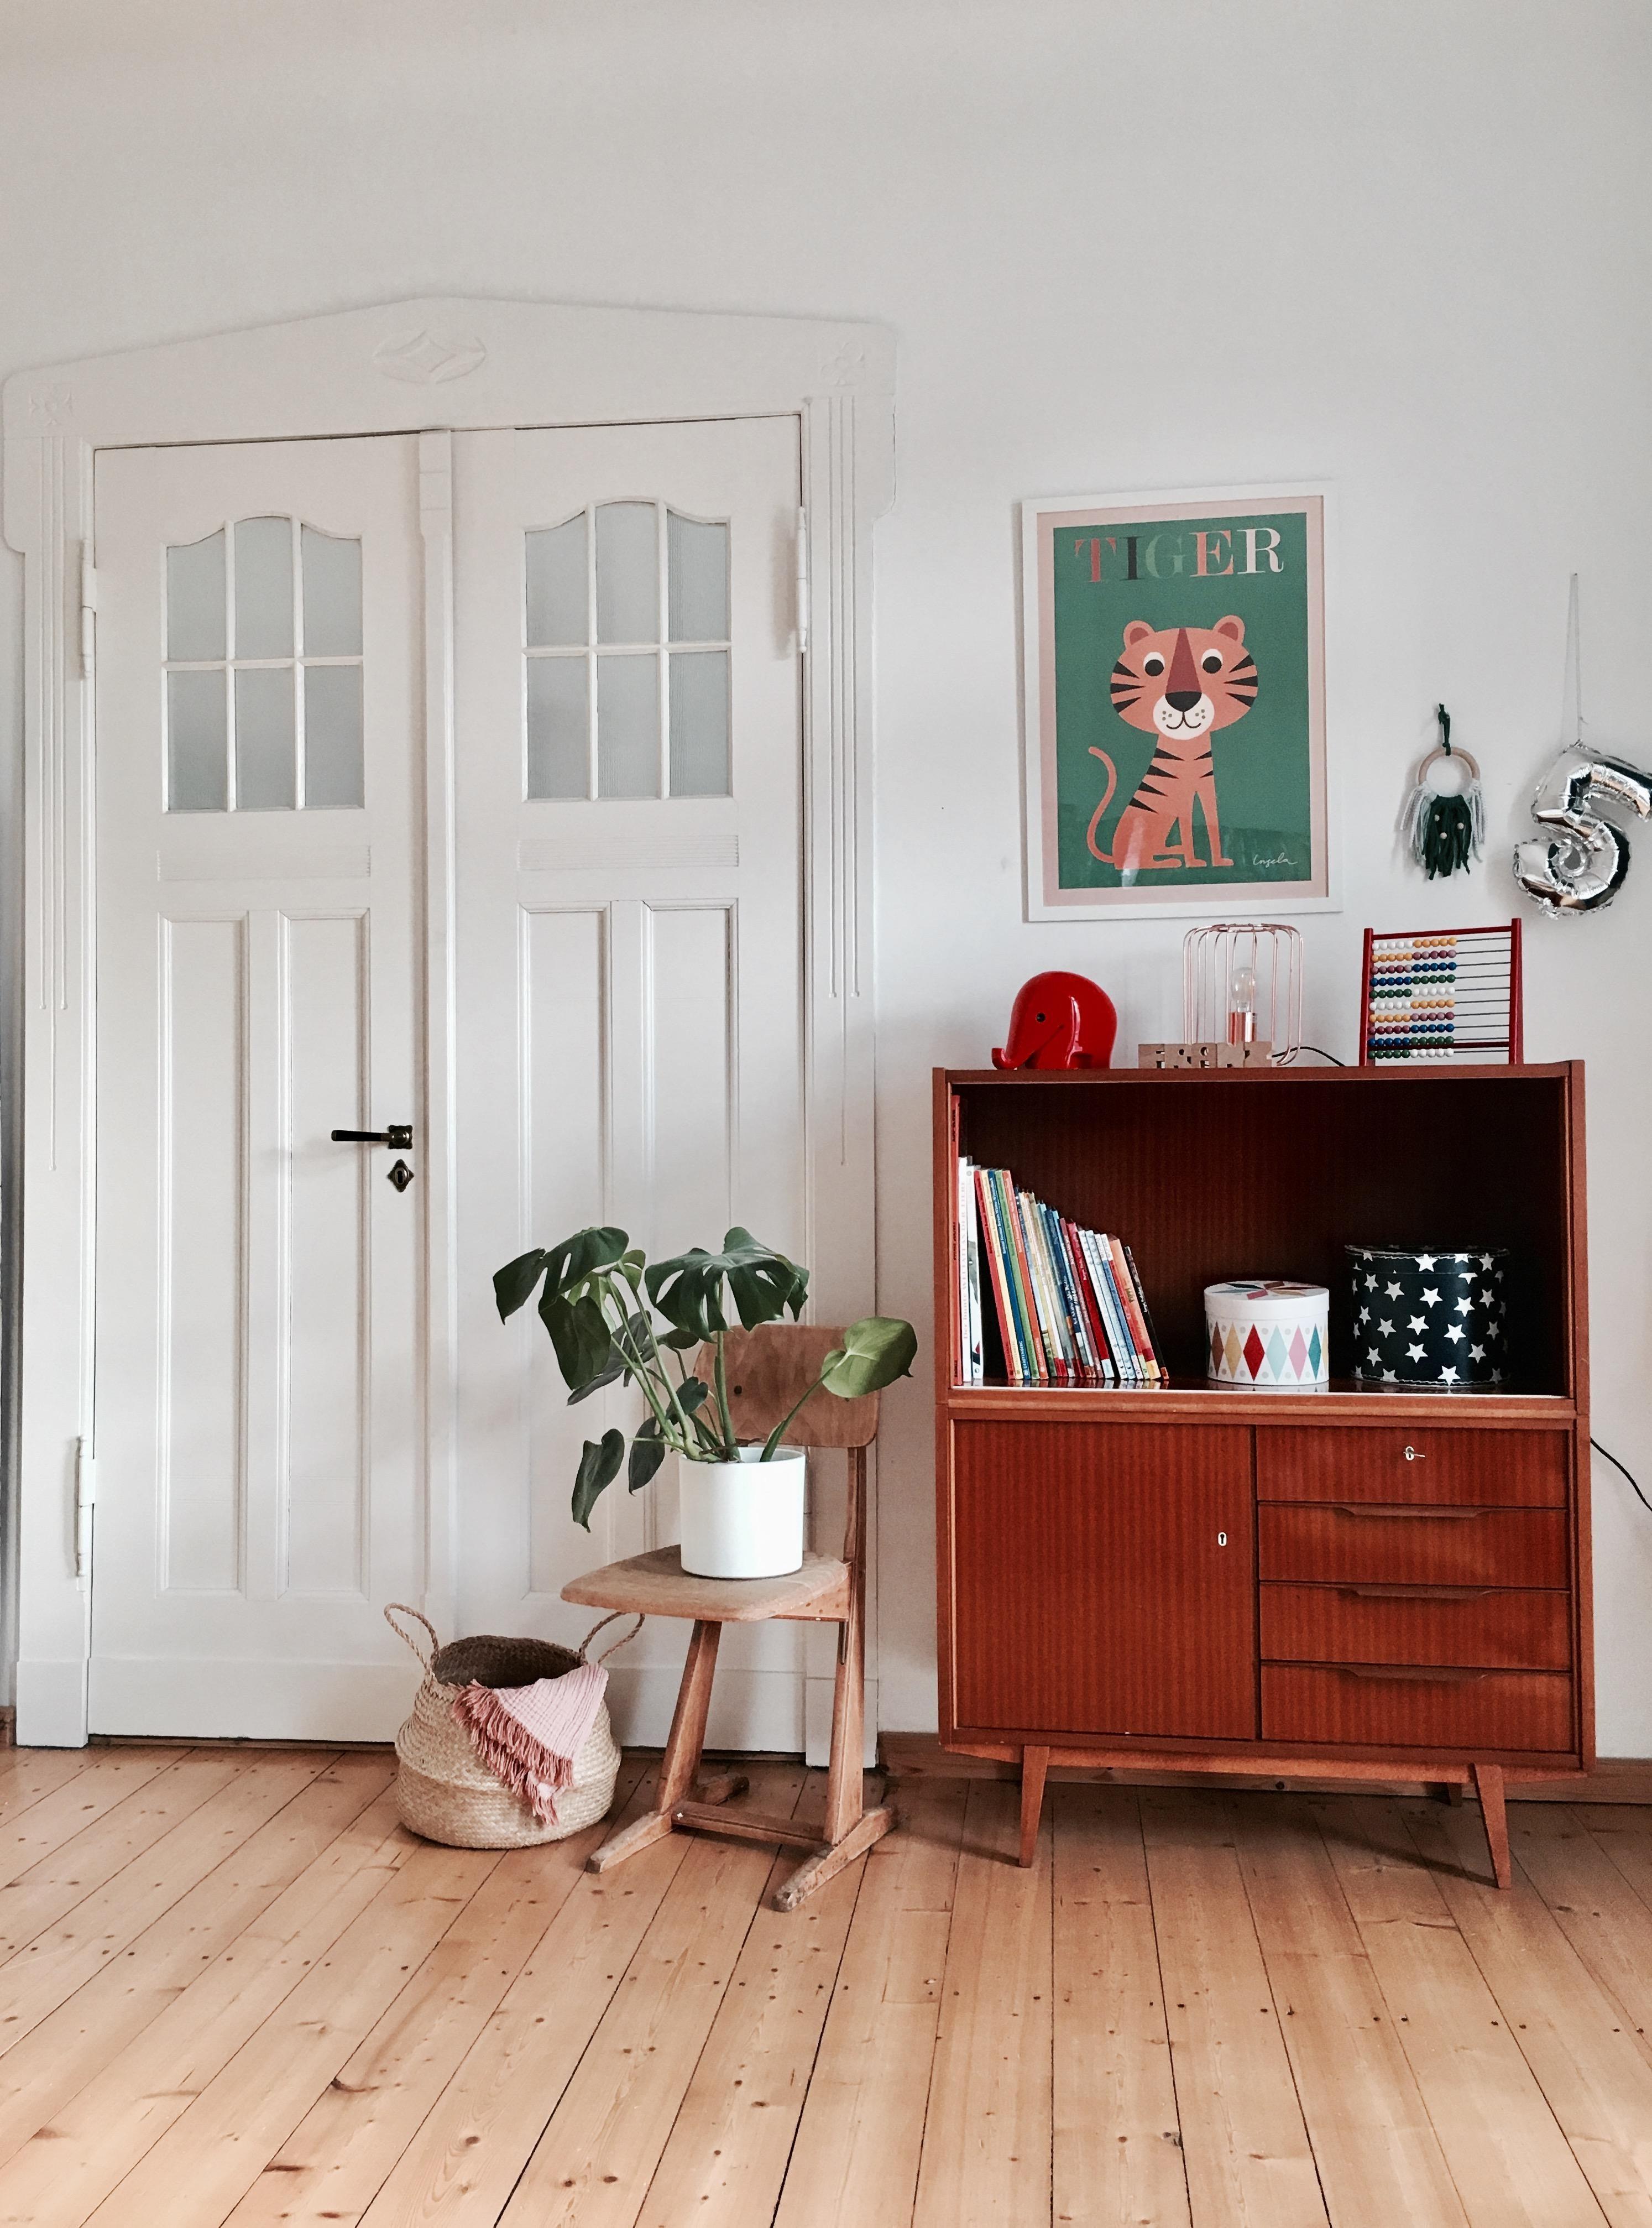 holzstuhl bilder ideen couch. Black Bedroom Furniture Sets. Home Design Ideas